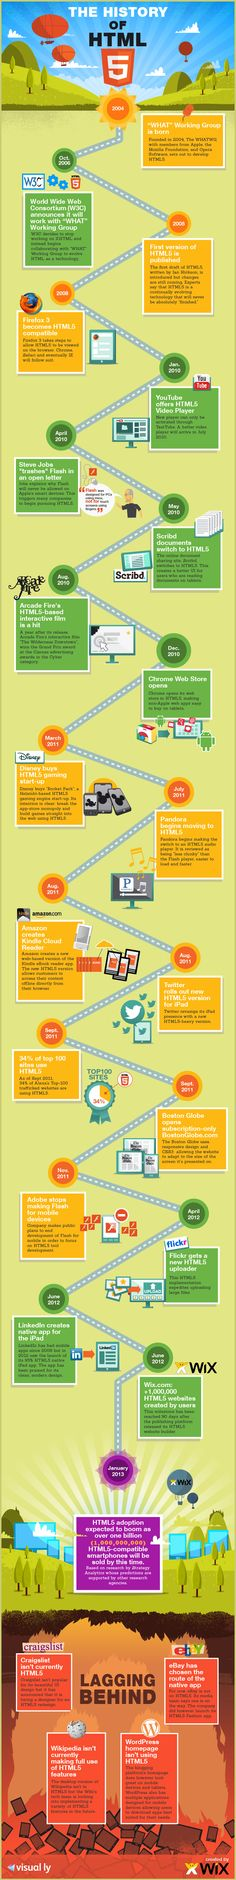 The History of HTML5 geek, webdesign, histori, social media marketing, web design, news, web development, blog, html5 infograph